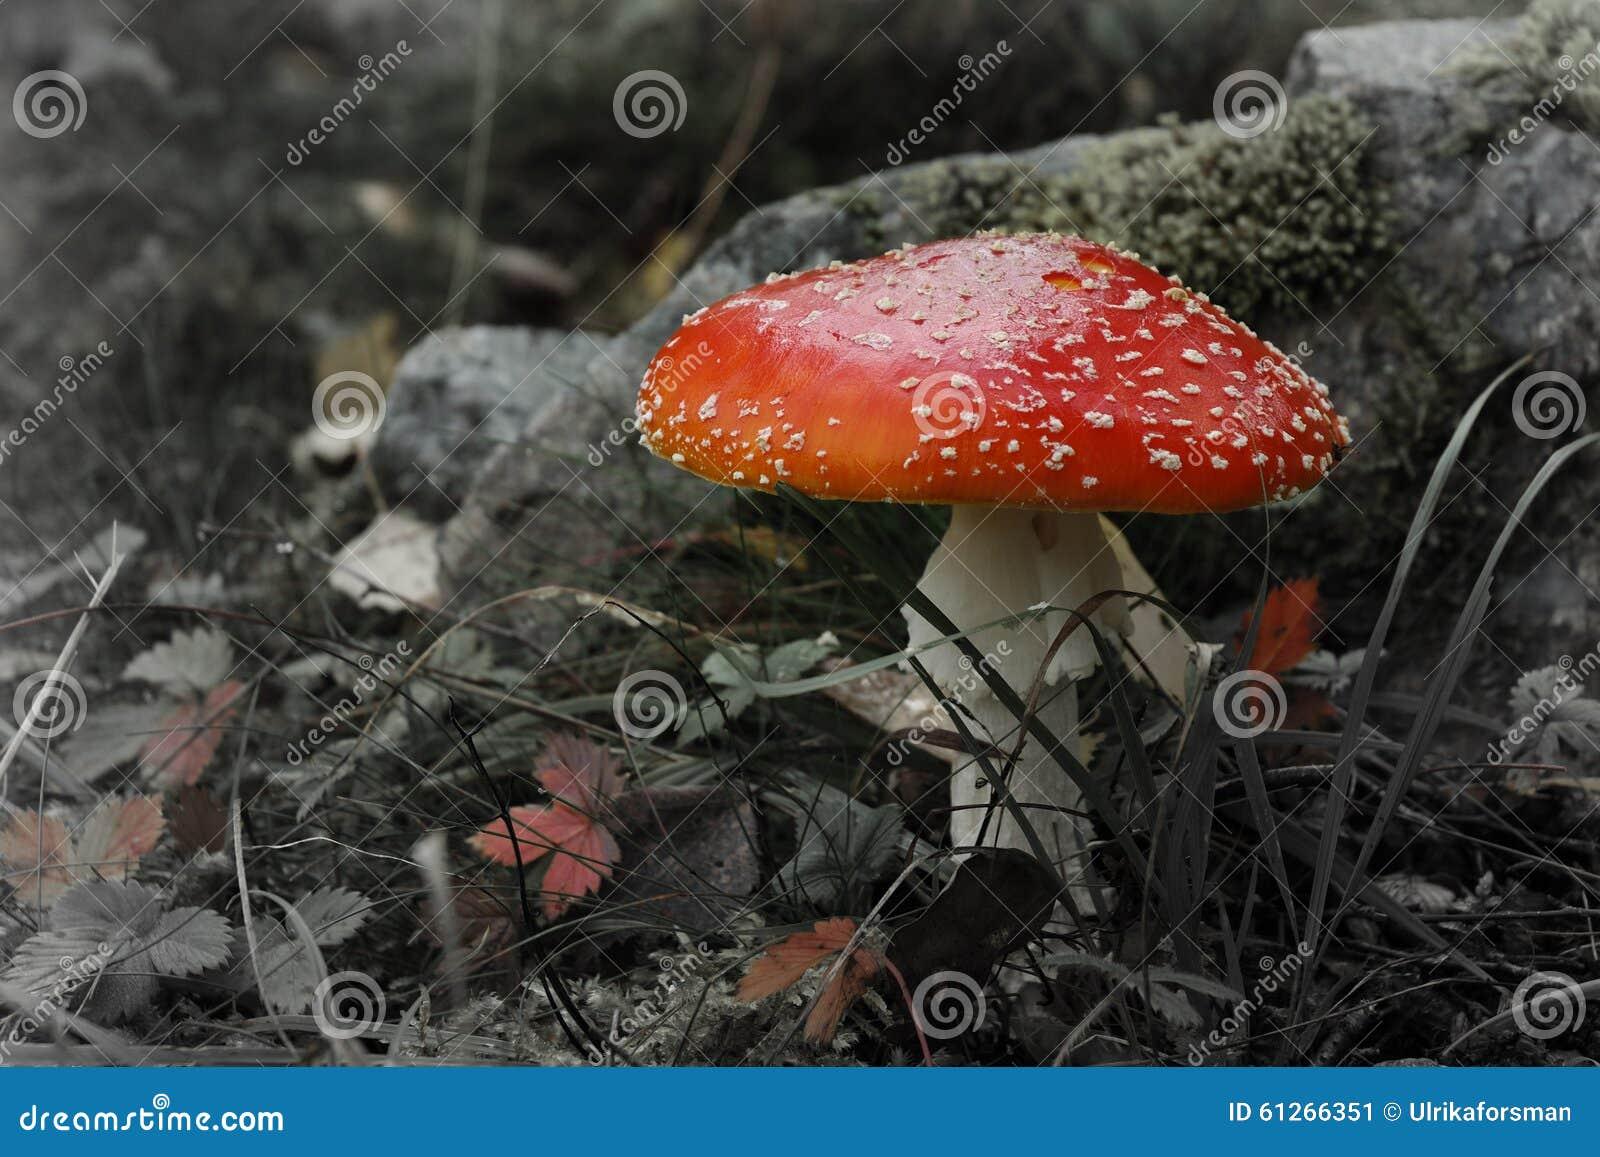 Red fly amanita poisonous mushroom